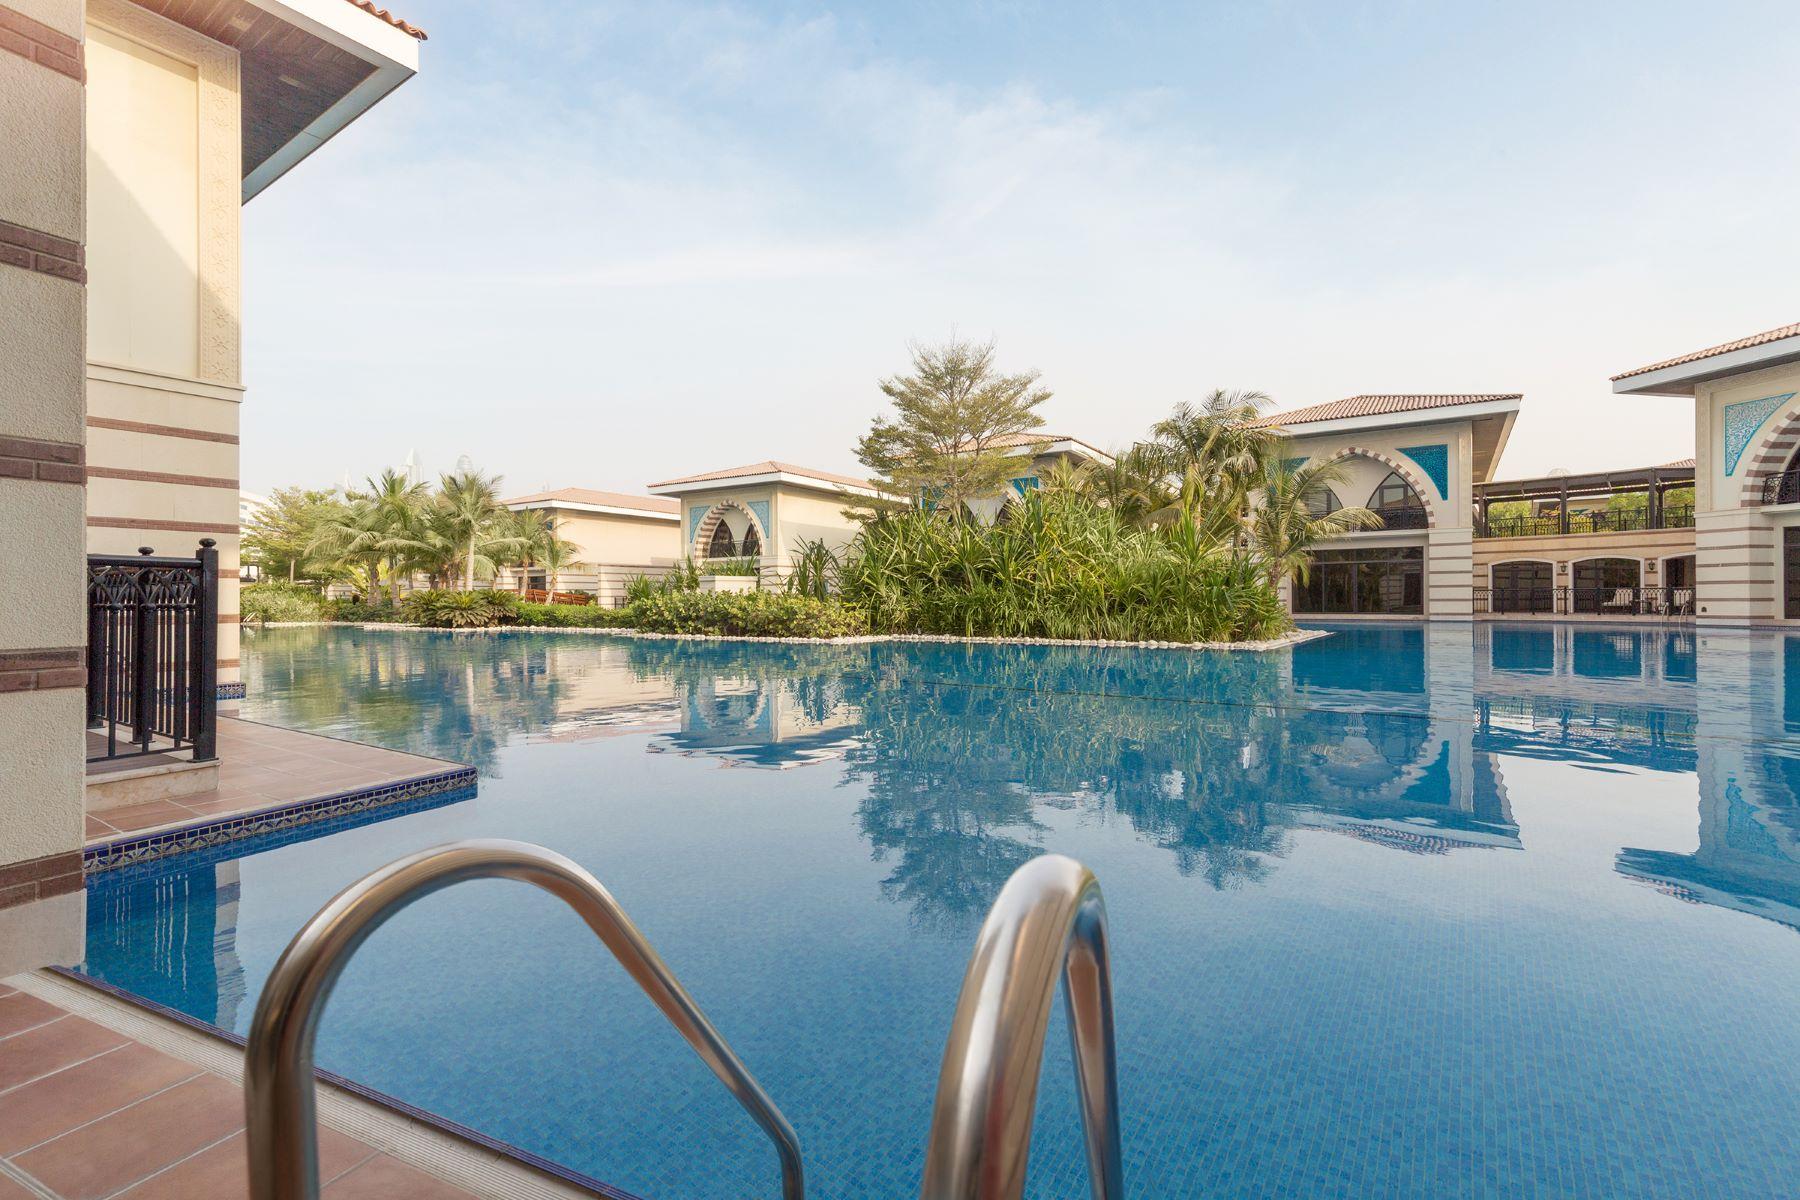 Single Family Home for Sale at 5 Bedroom Villa with Gym Lagoon View Dubai, Dubai United Arab Emirates